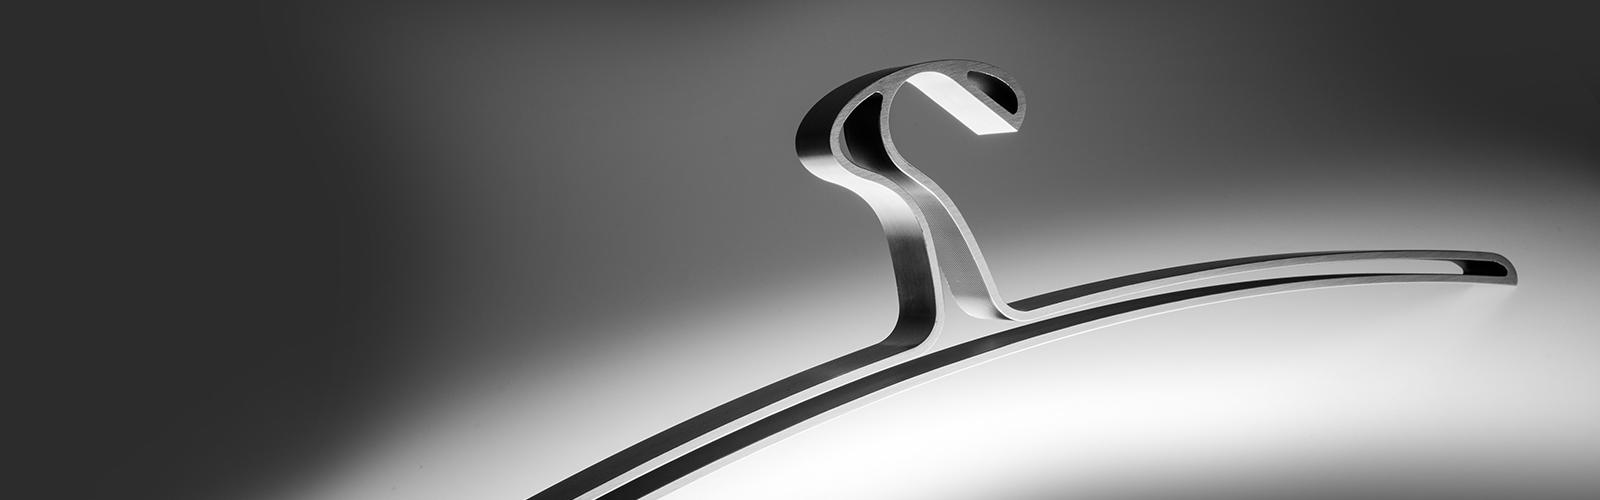 Braunwagner Produkt Industrie Mobility Design Bugatti Kleiderbügel